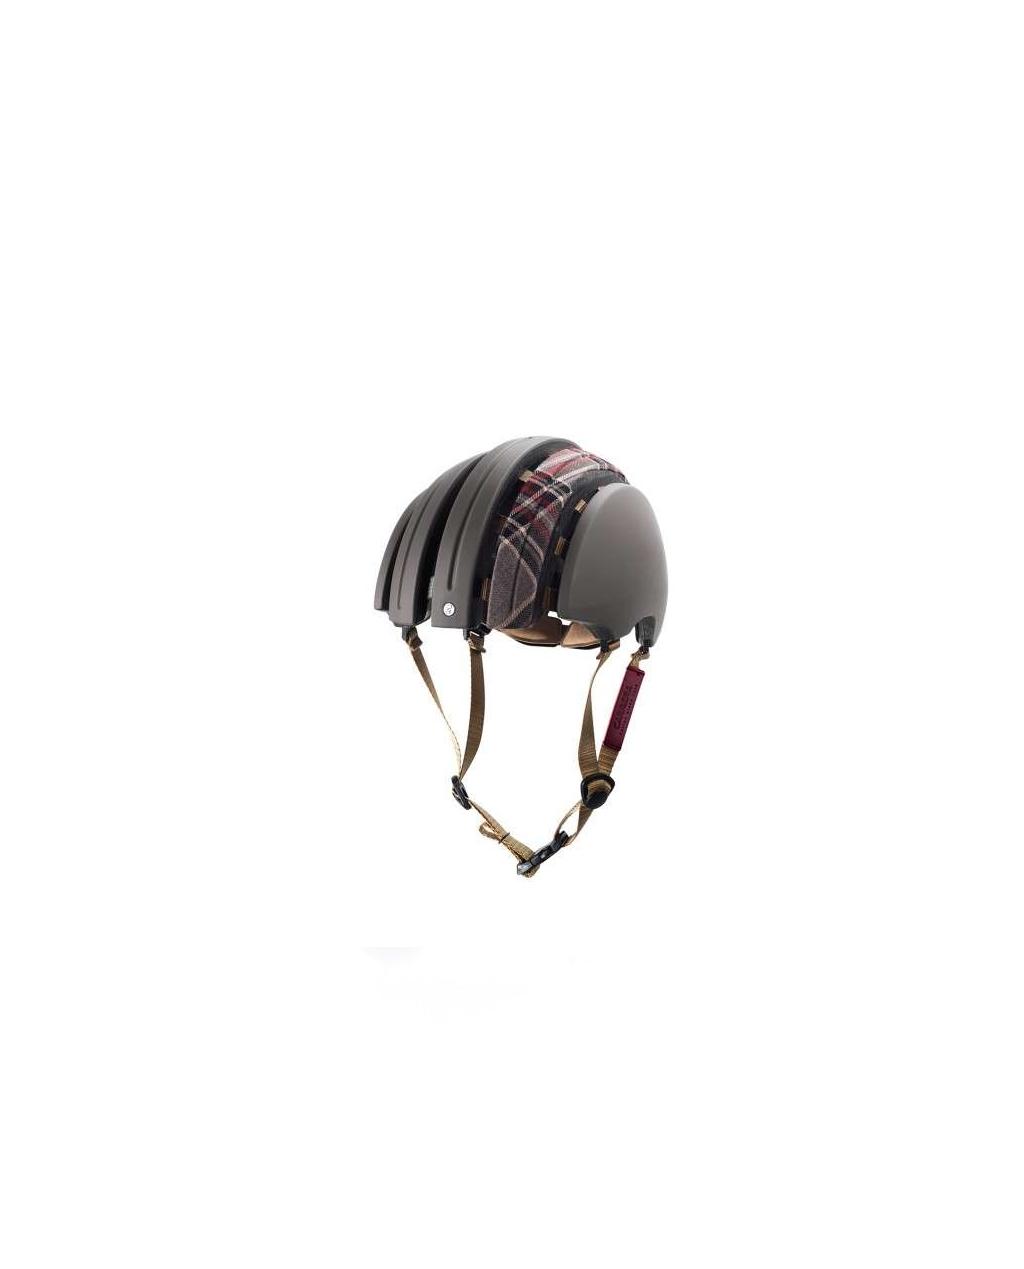 Brooks - Carrera Foldable Helmet - Dark Grey / Grey Tartan